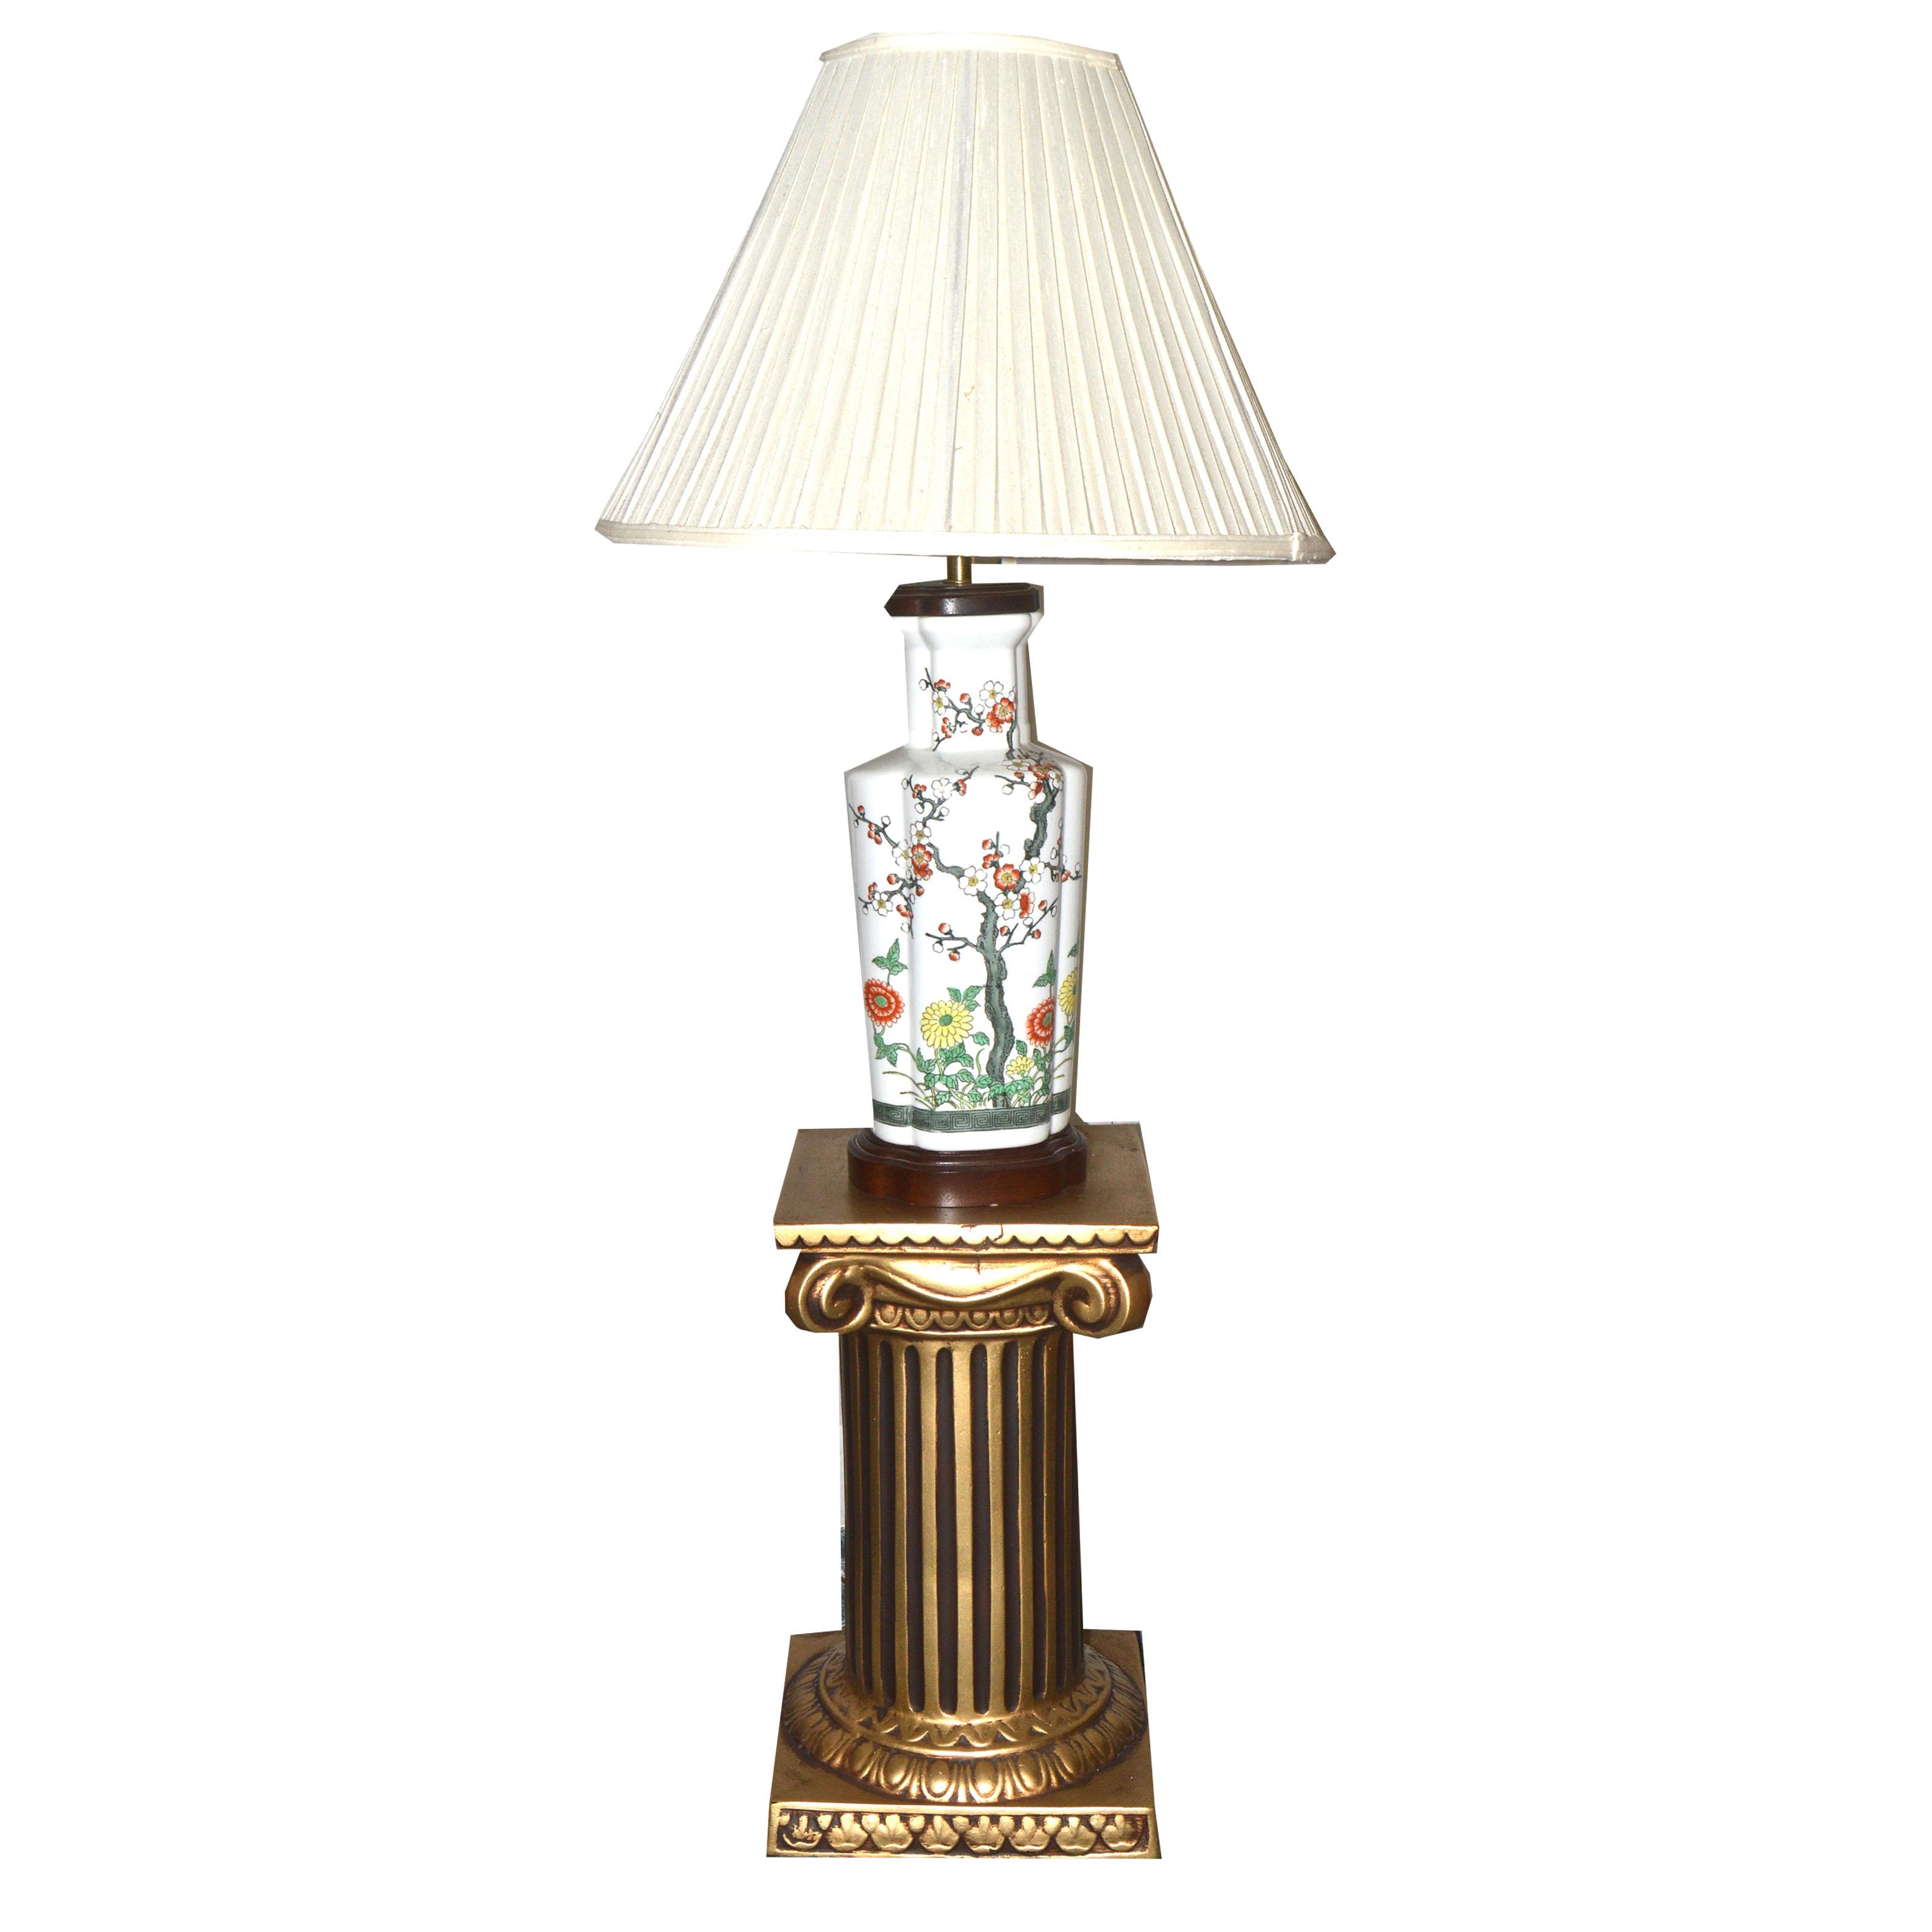 Decorative Arts Painted Column Form Floor Lamp Antiques